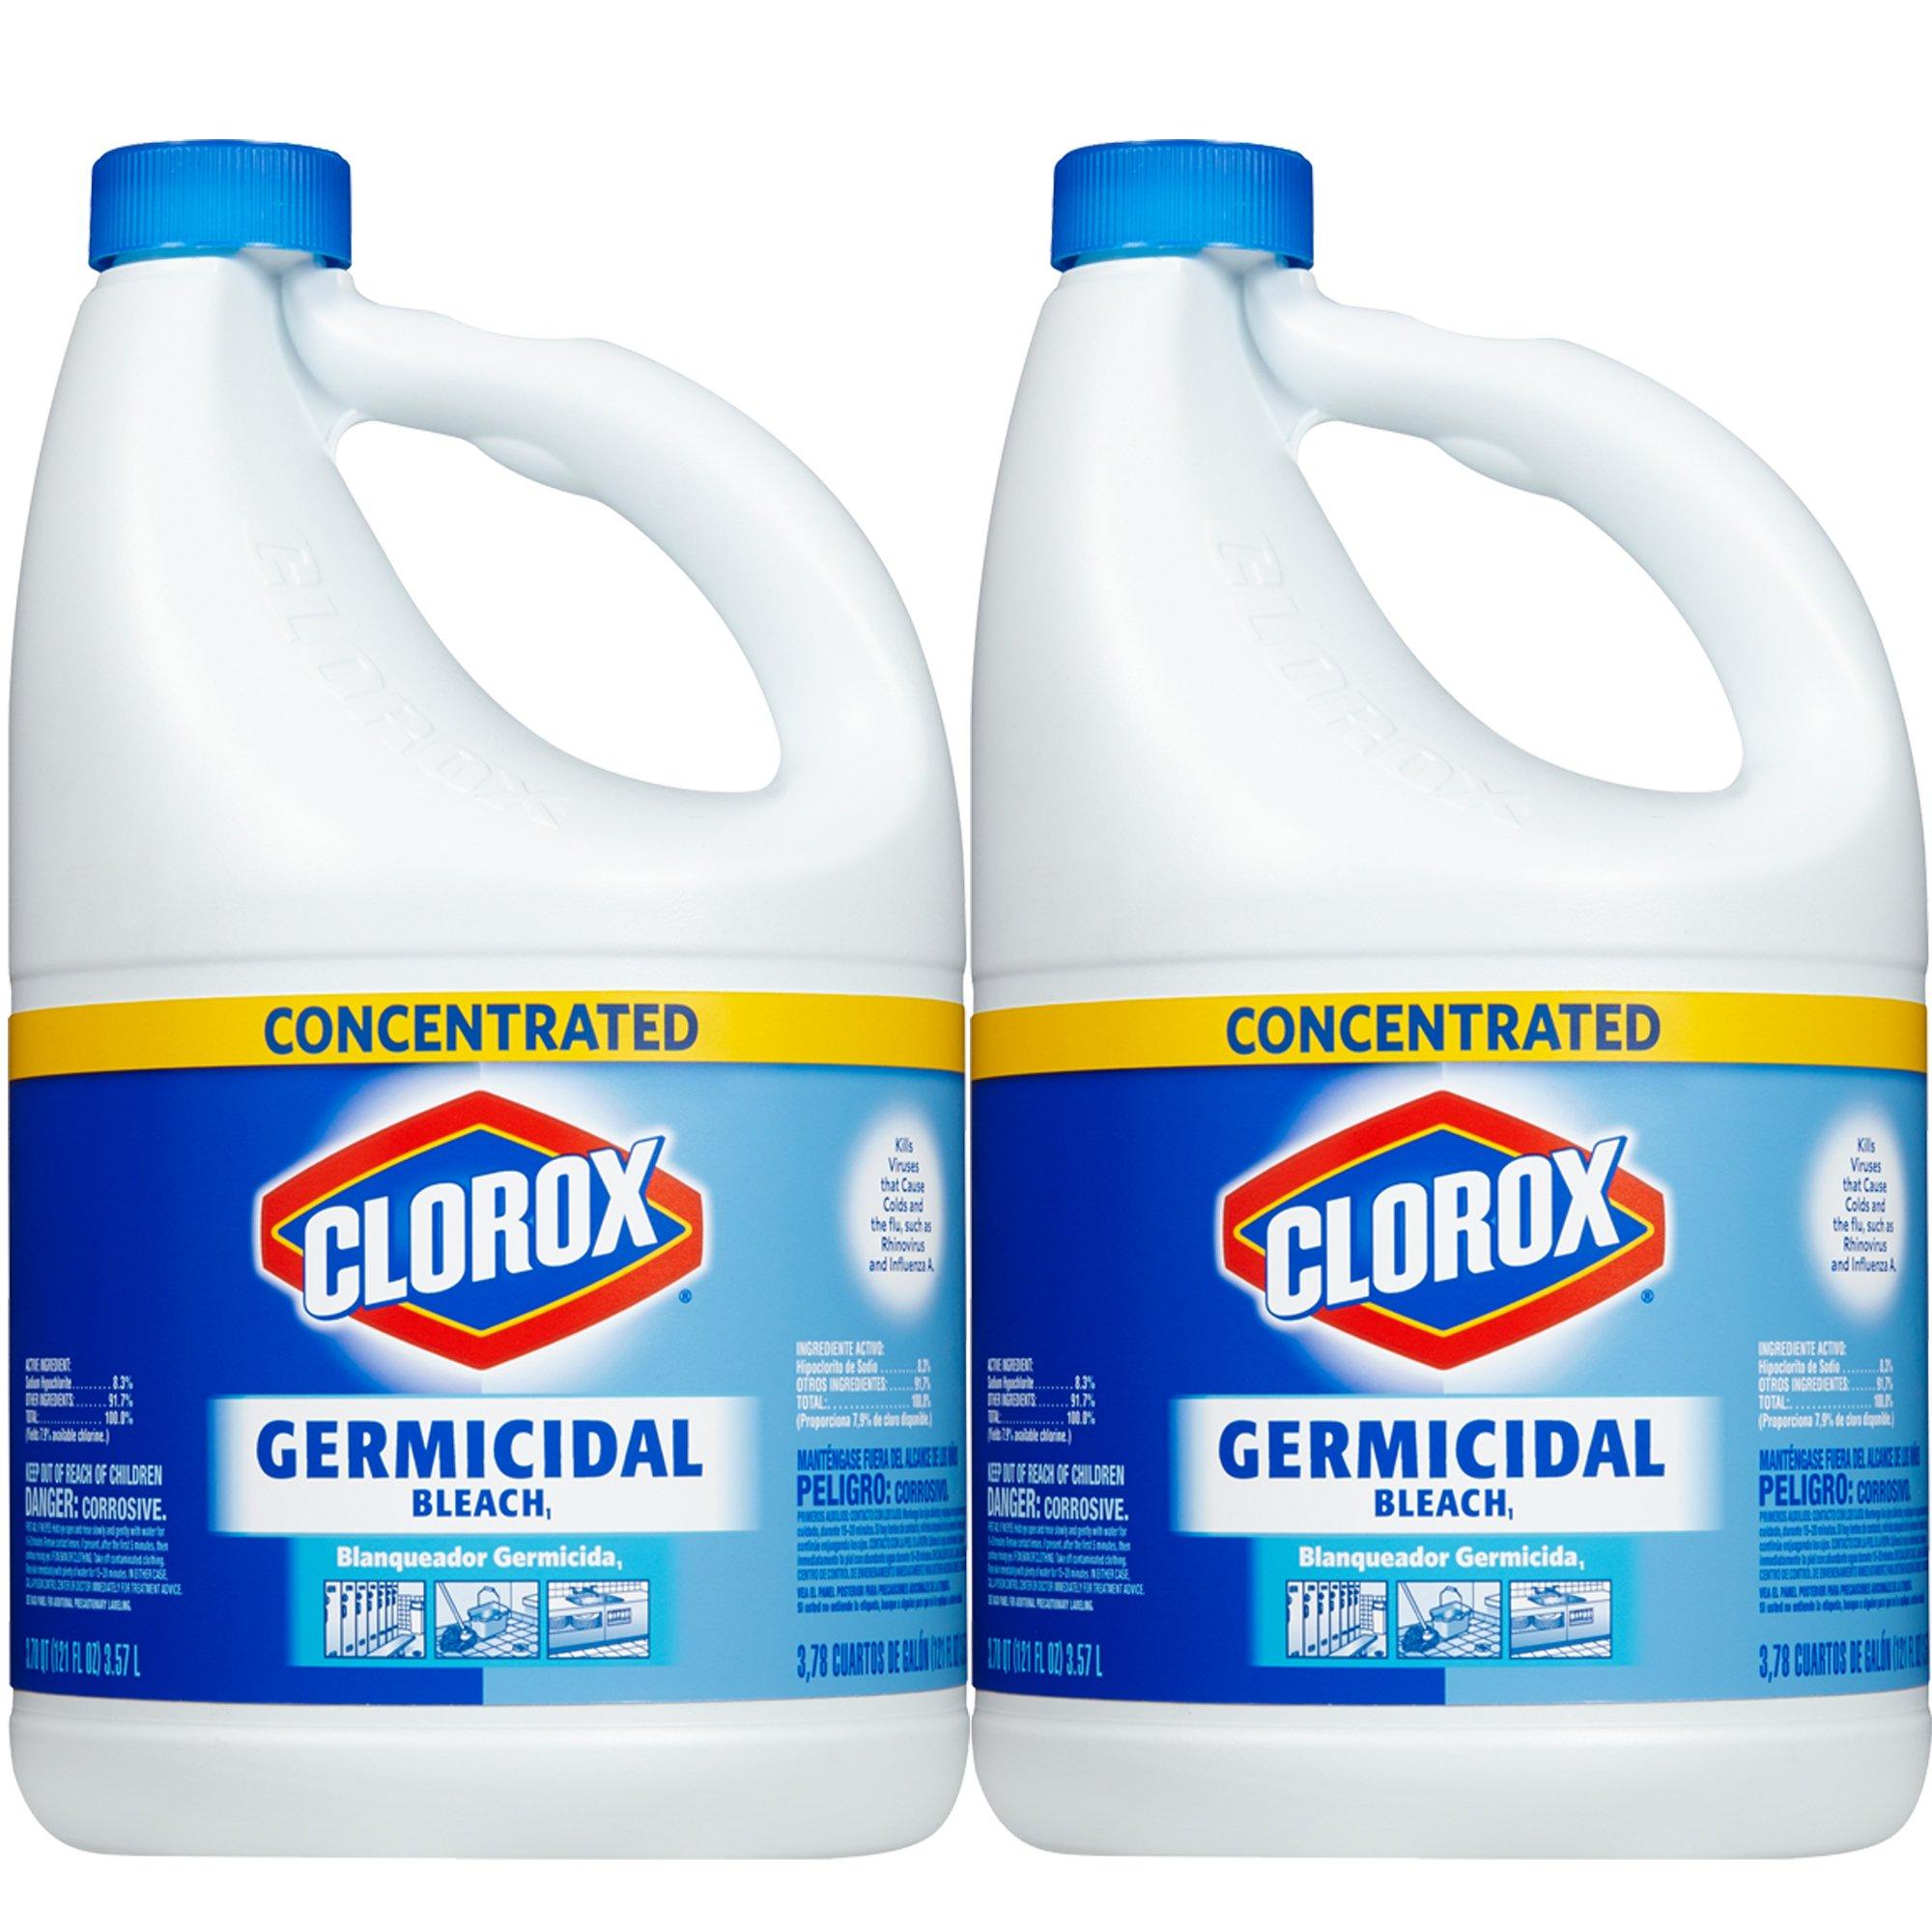 Clorox Germicidal Concentrated Liquid Bleach, 121 oz, 2-Pack